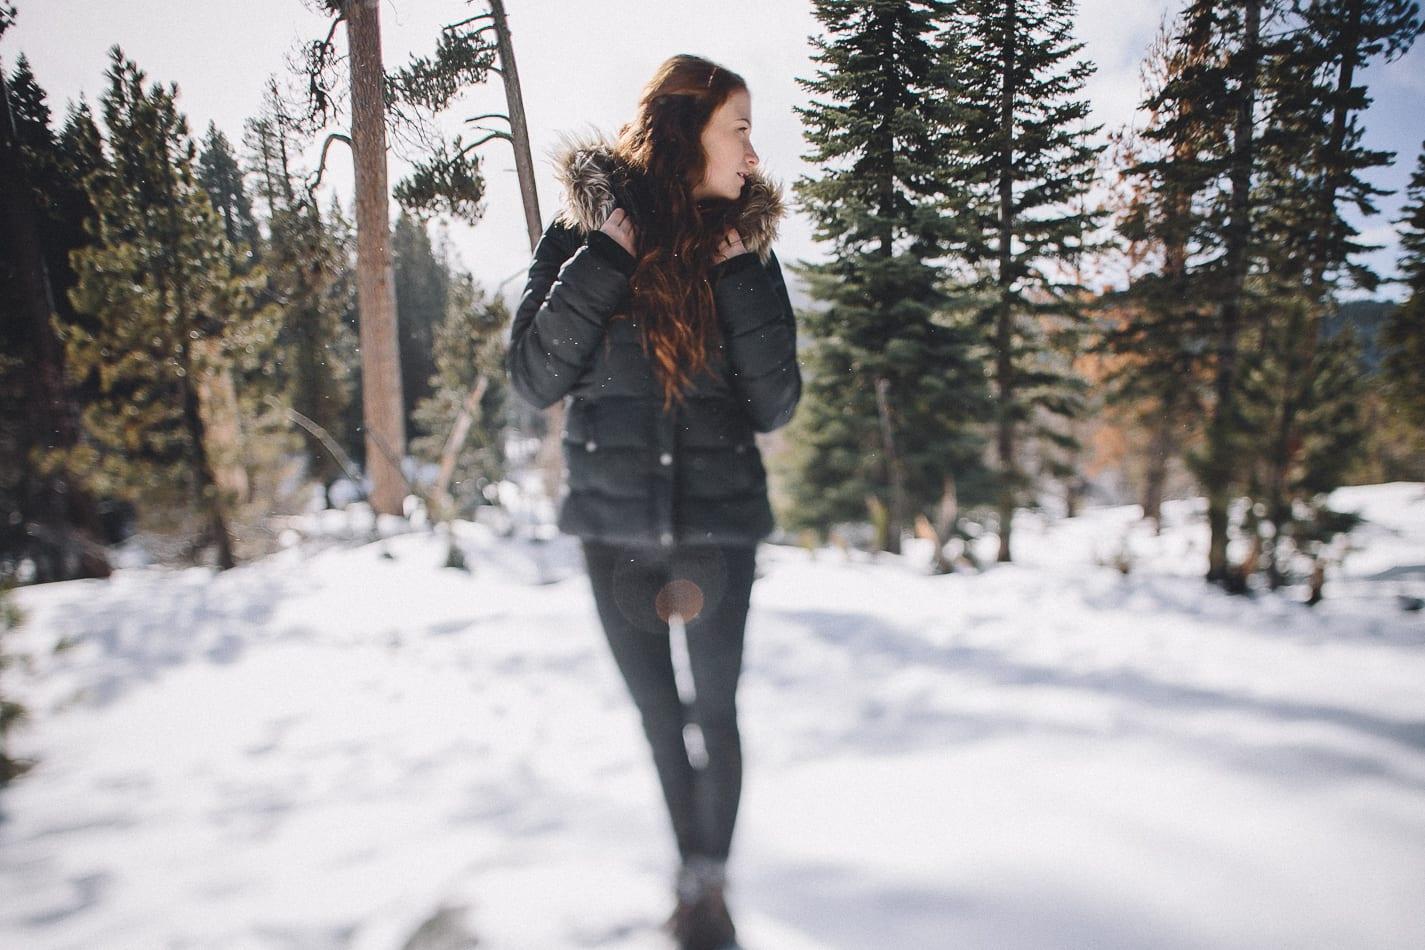 mount-lassen-winter-portrait-photo-1